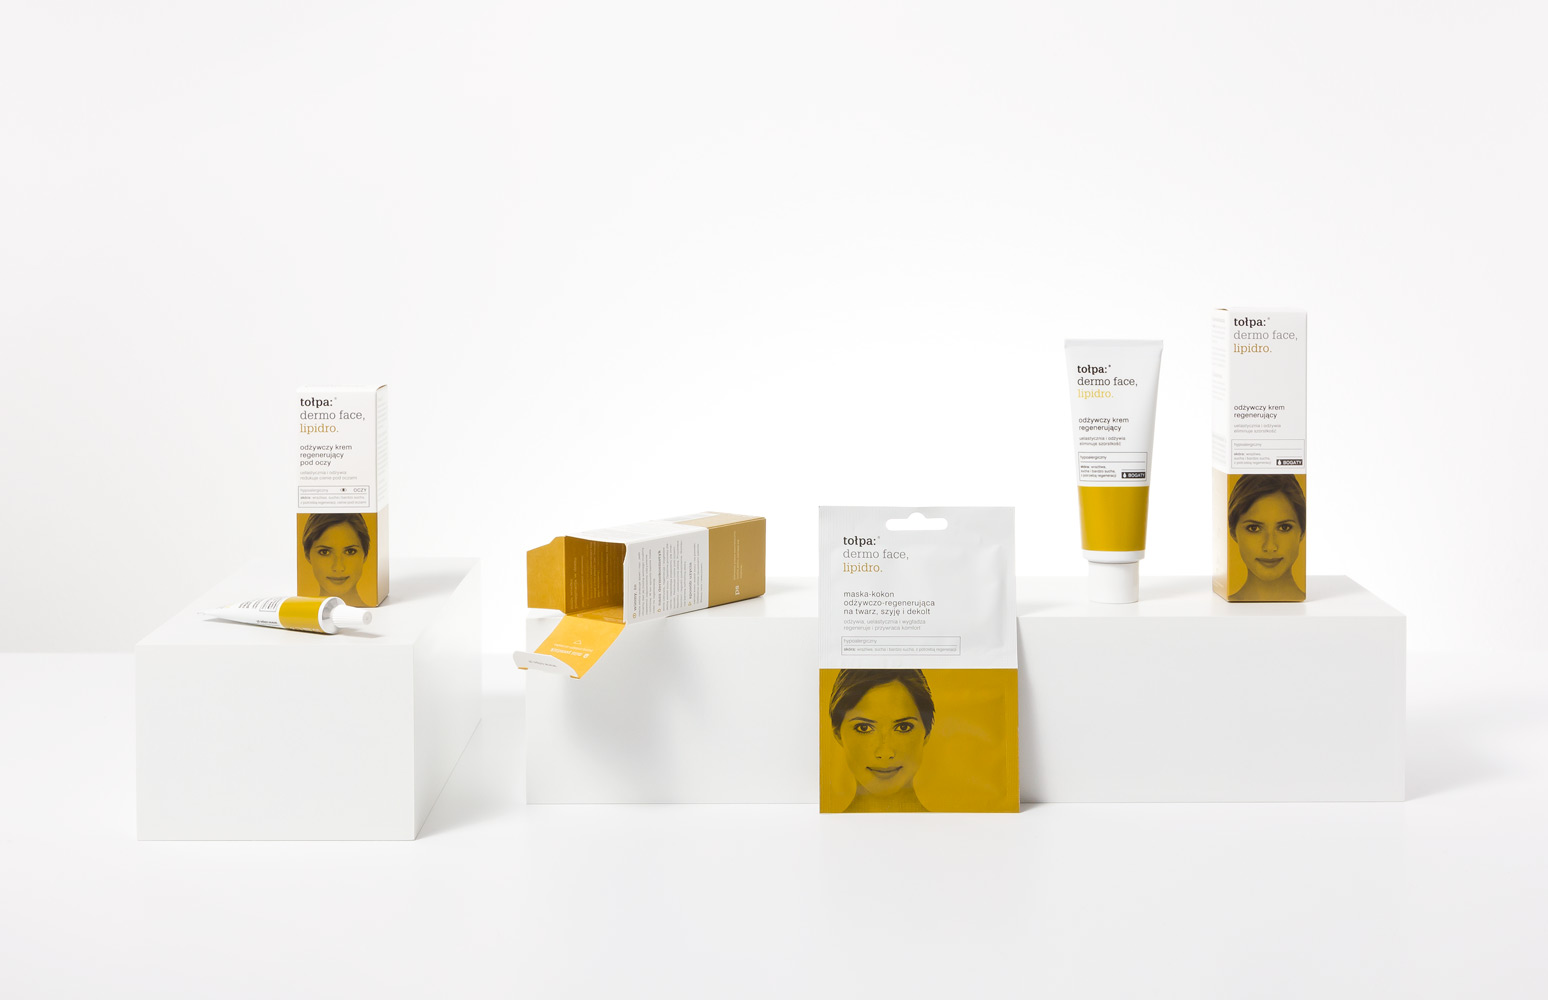 topa 系列化妆品包装设计欣赏